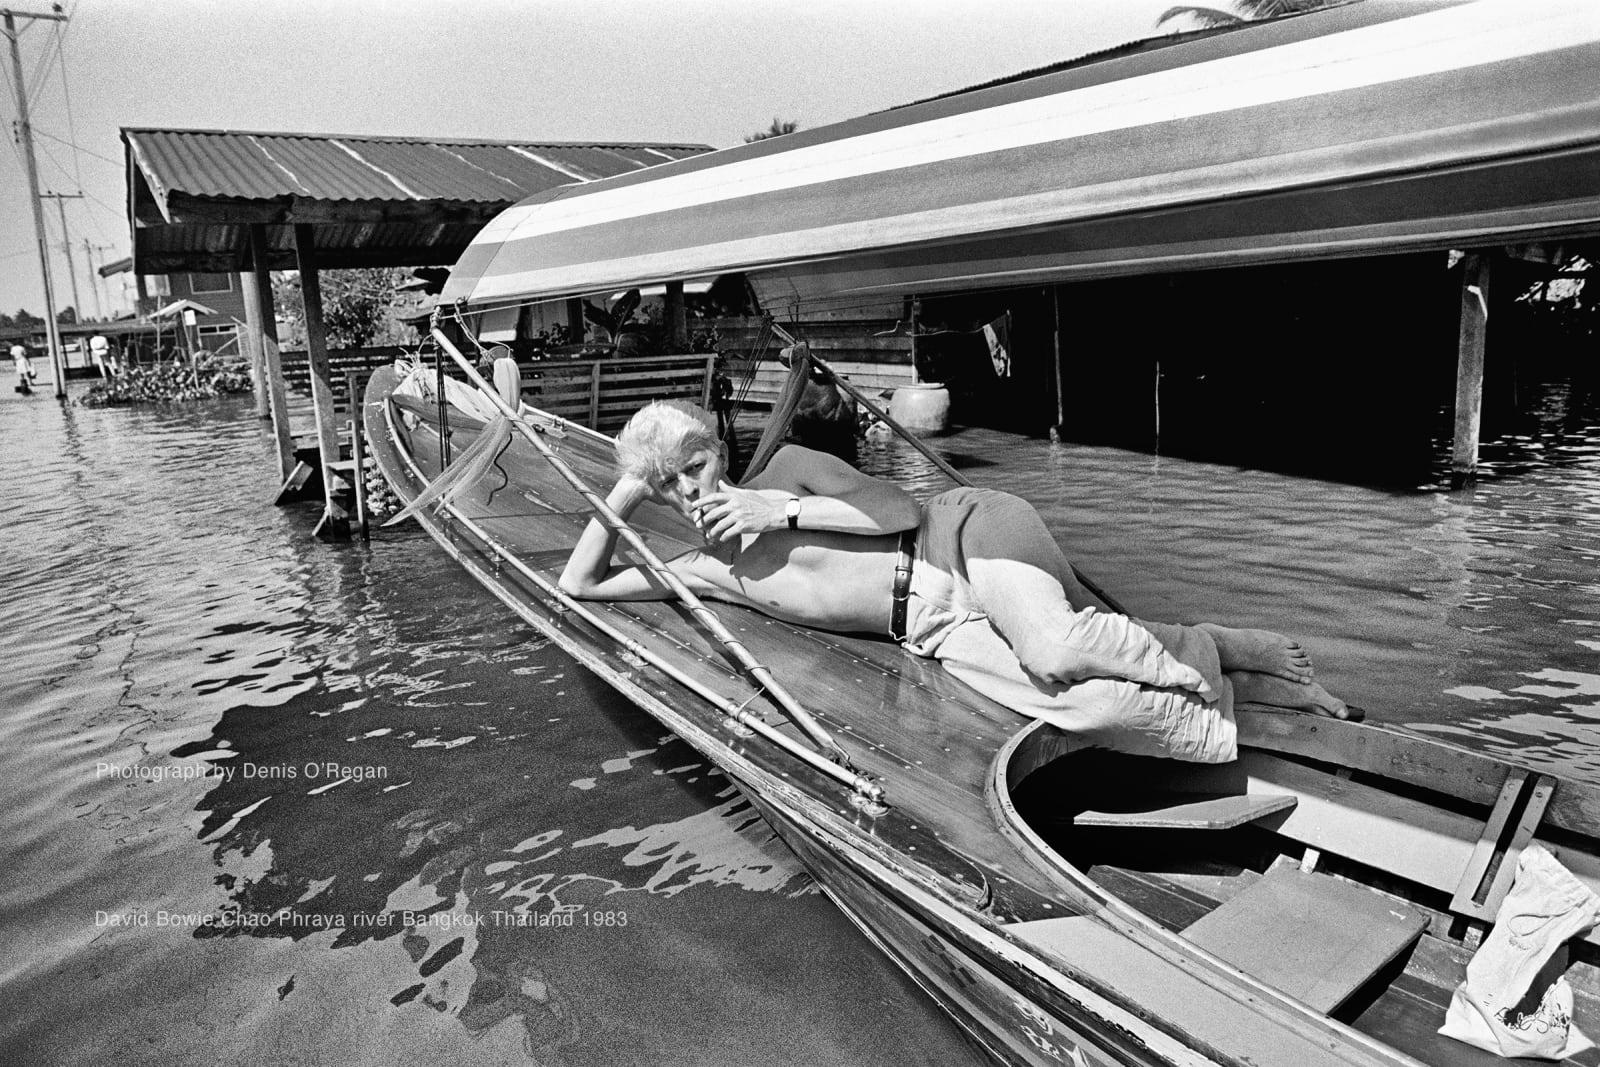 DAVID BOWIE, David Bowie Bangkok Thailand, 1983